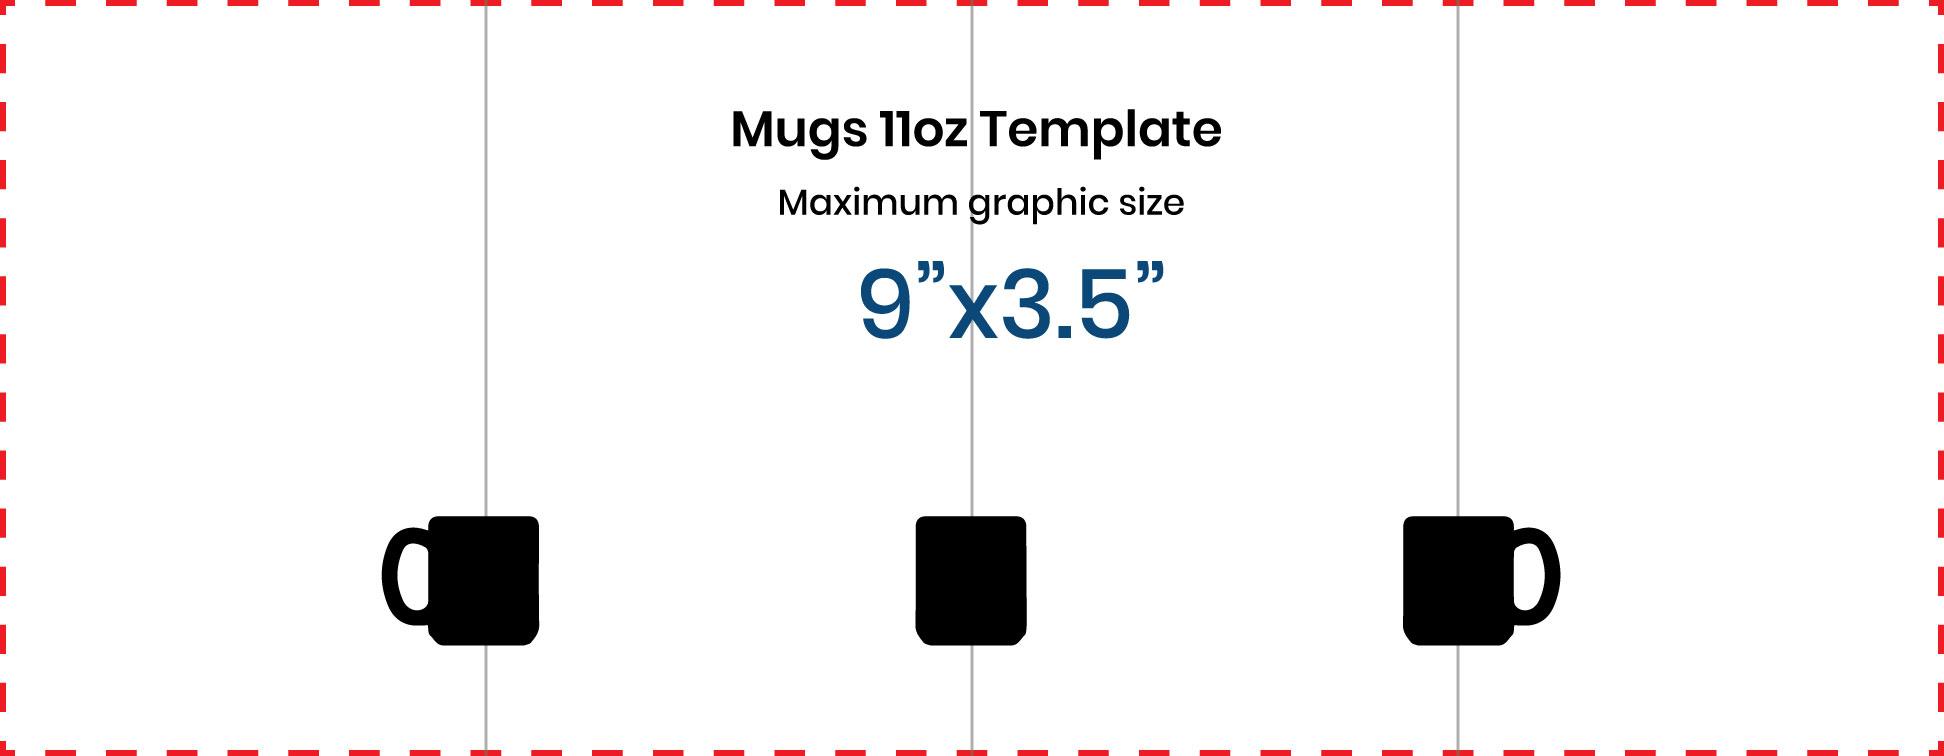 maximum printable area for mugs